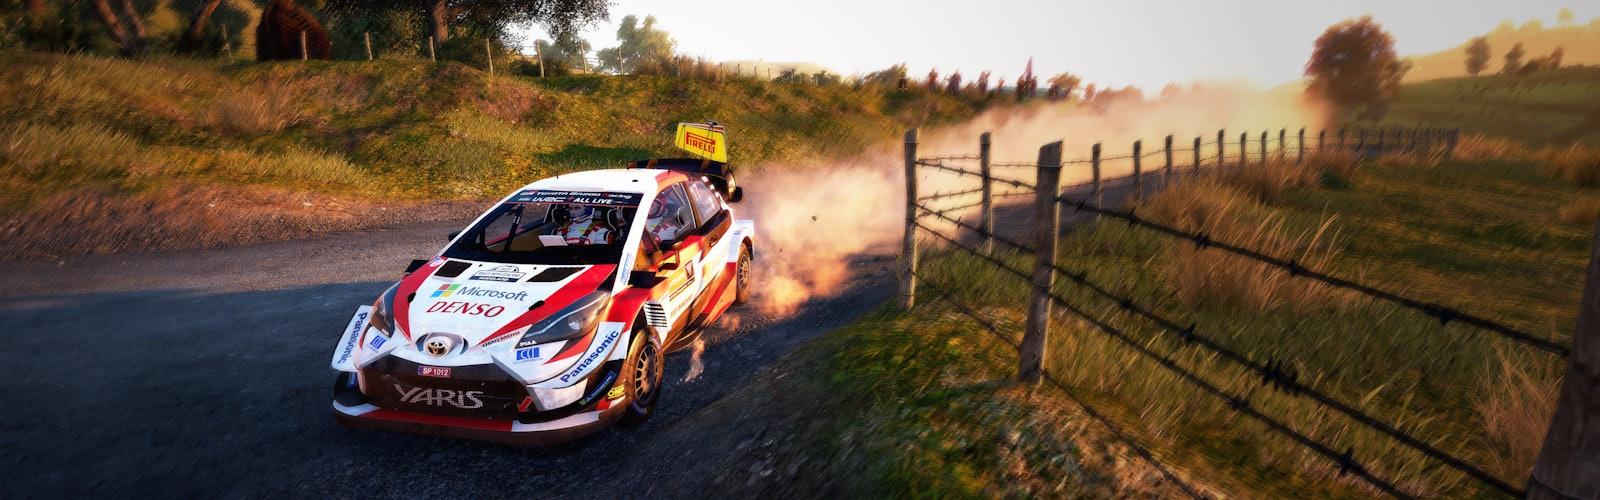 WRC9_Screenshots_1_New_Zealand_Toyota_1_4K